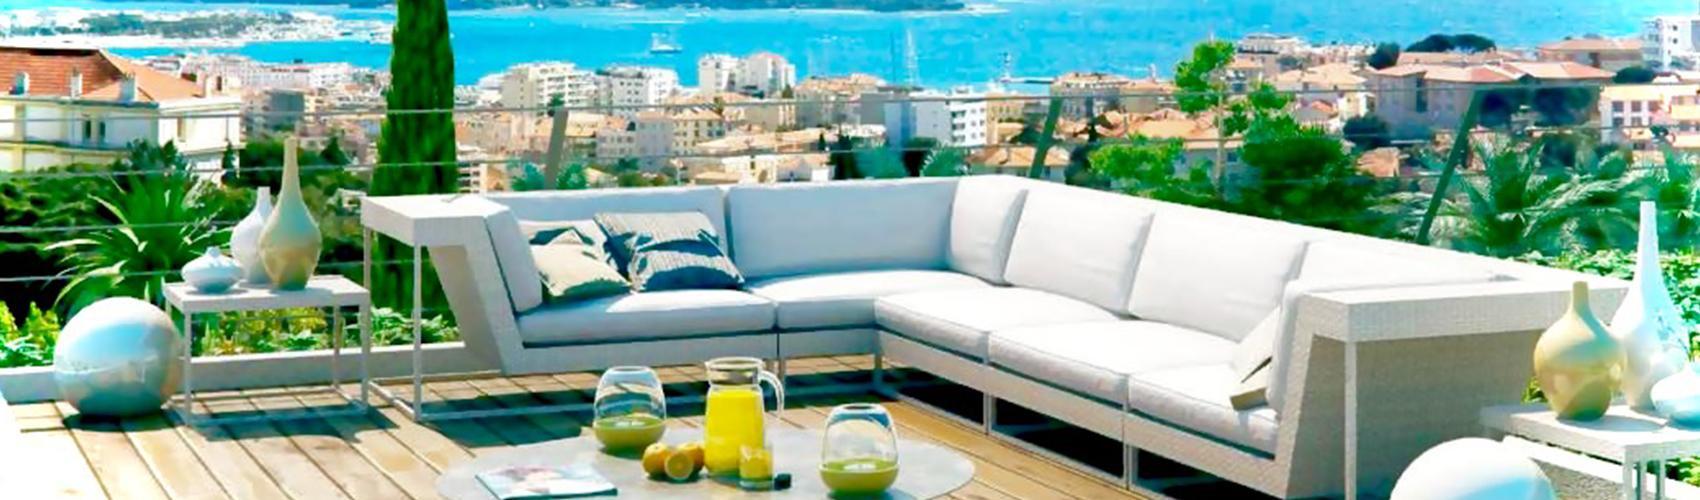 Photo du programme immobilier neuf CAN-507 à Cannes